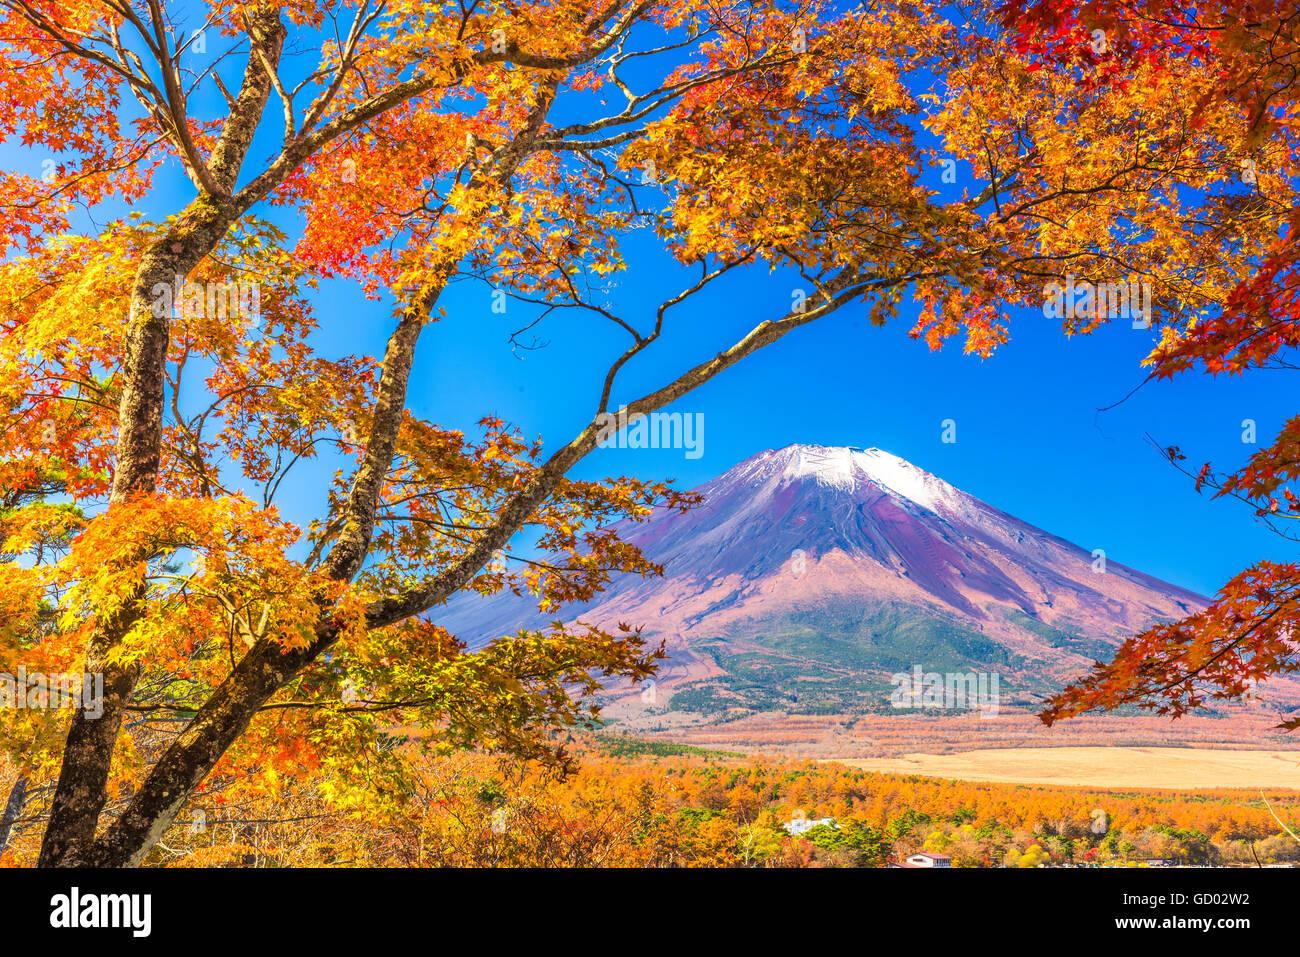 Mt. Fuji, Japan vom Yamanaka-See im Herbst. Stockbild